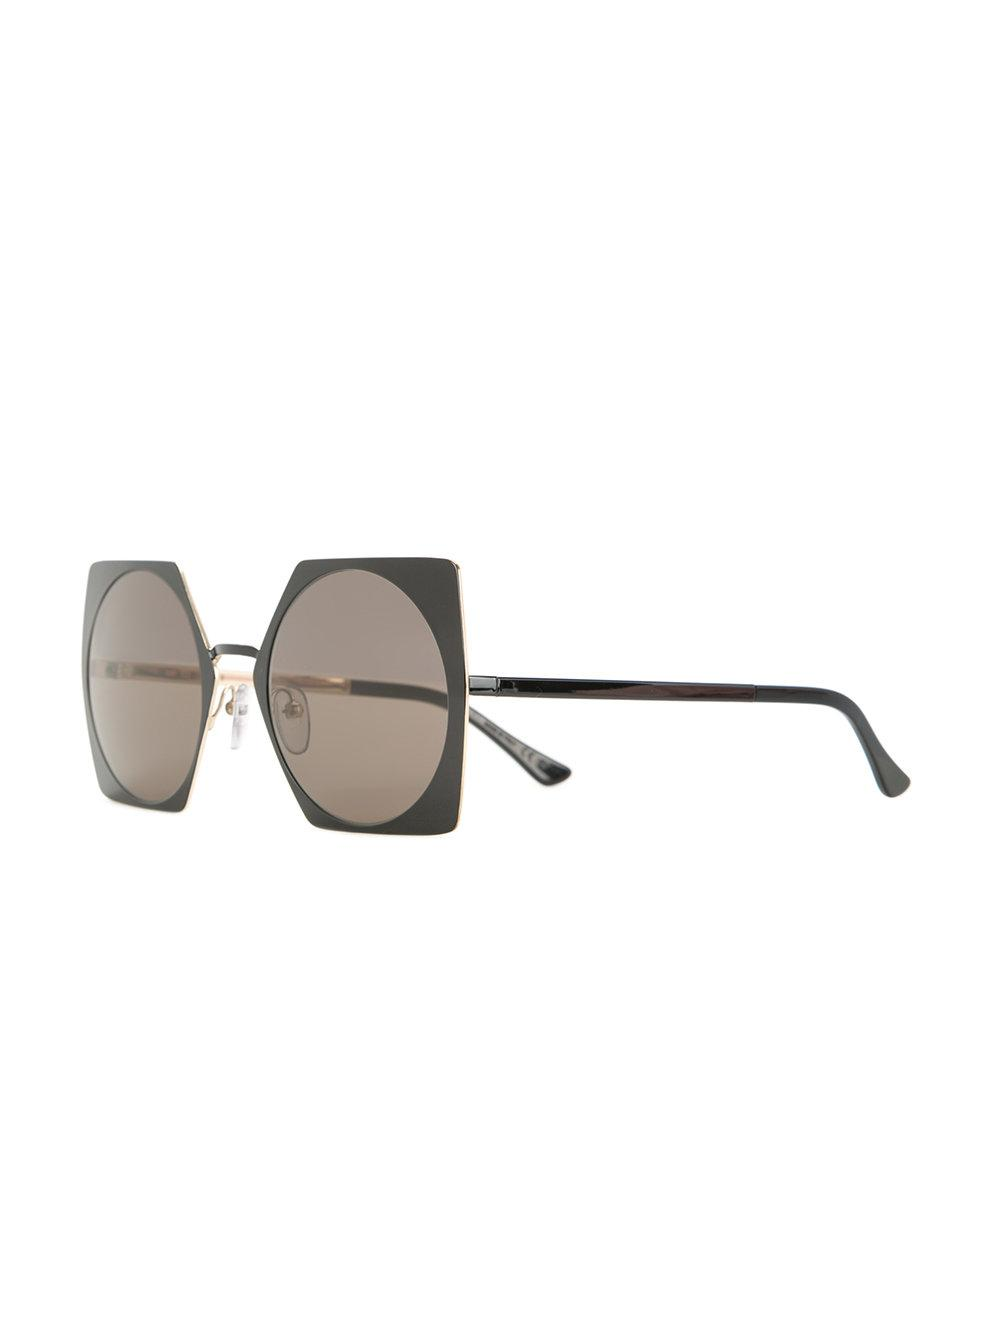 9e099269f23 Marni Eyewear Square Frame Sunglasses in Black - Lyst